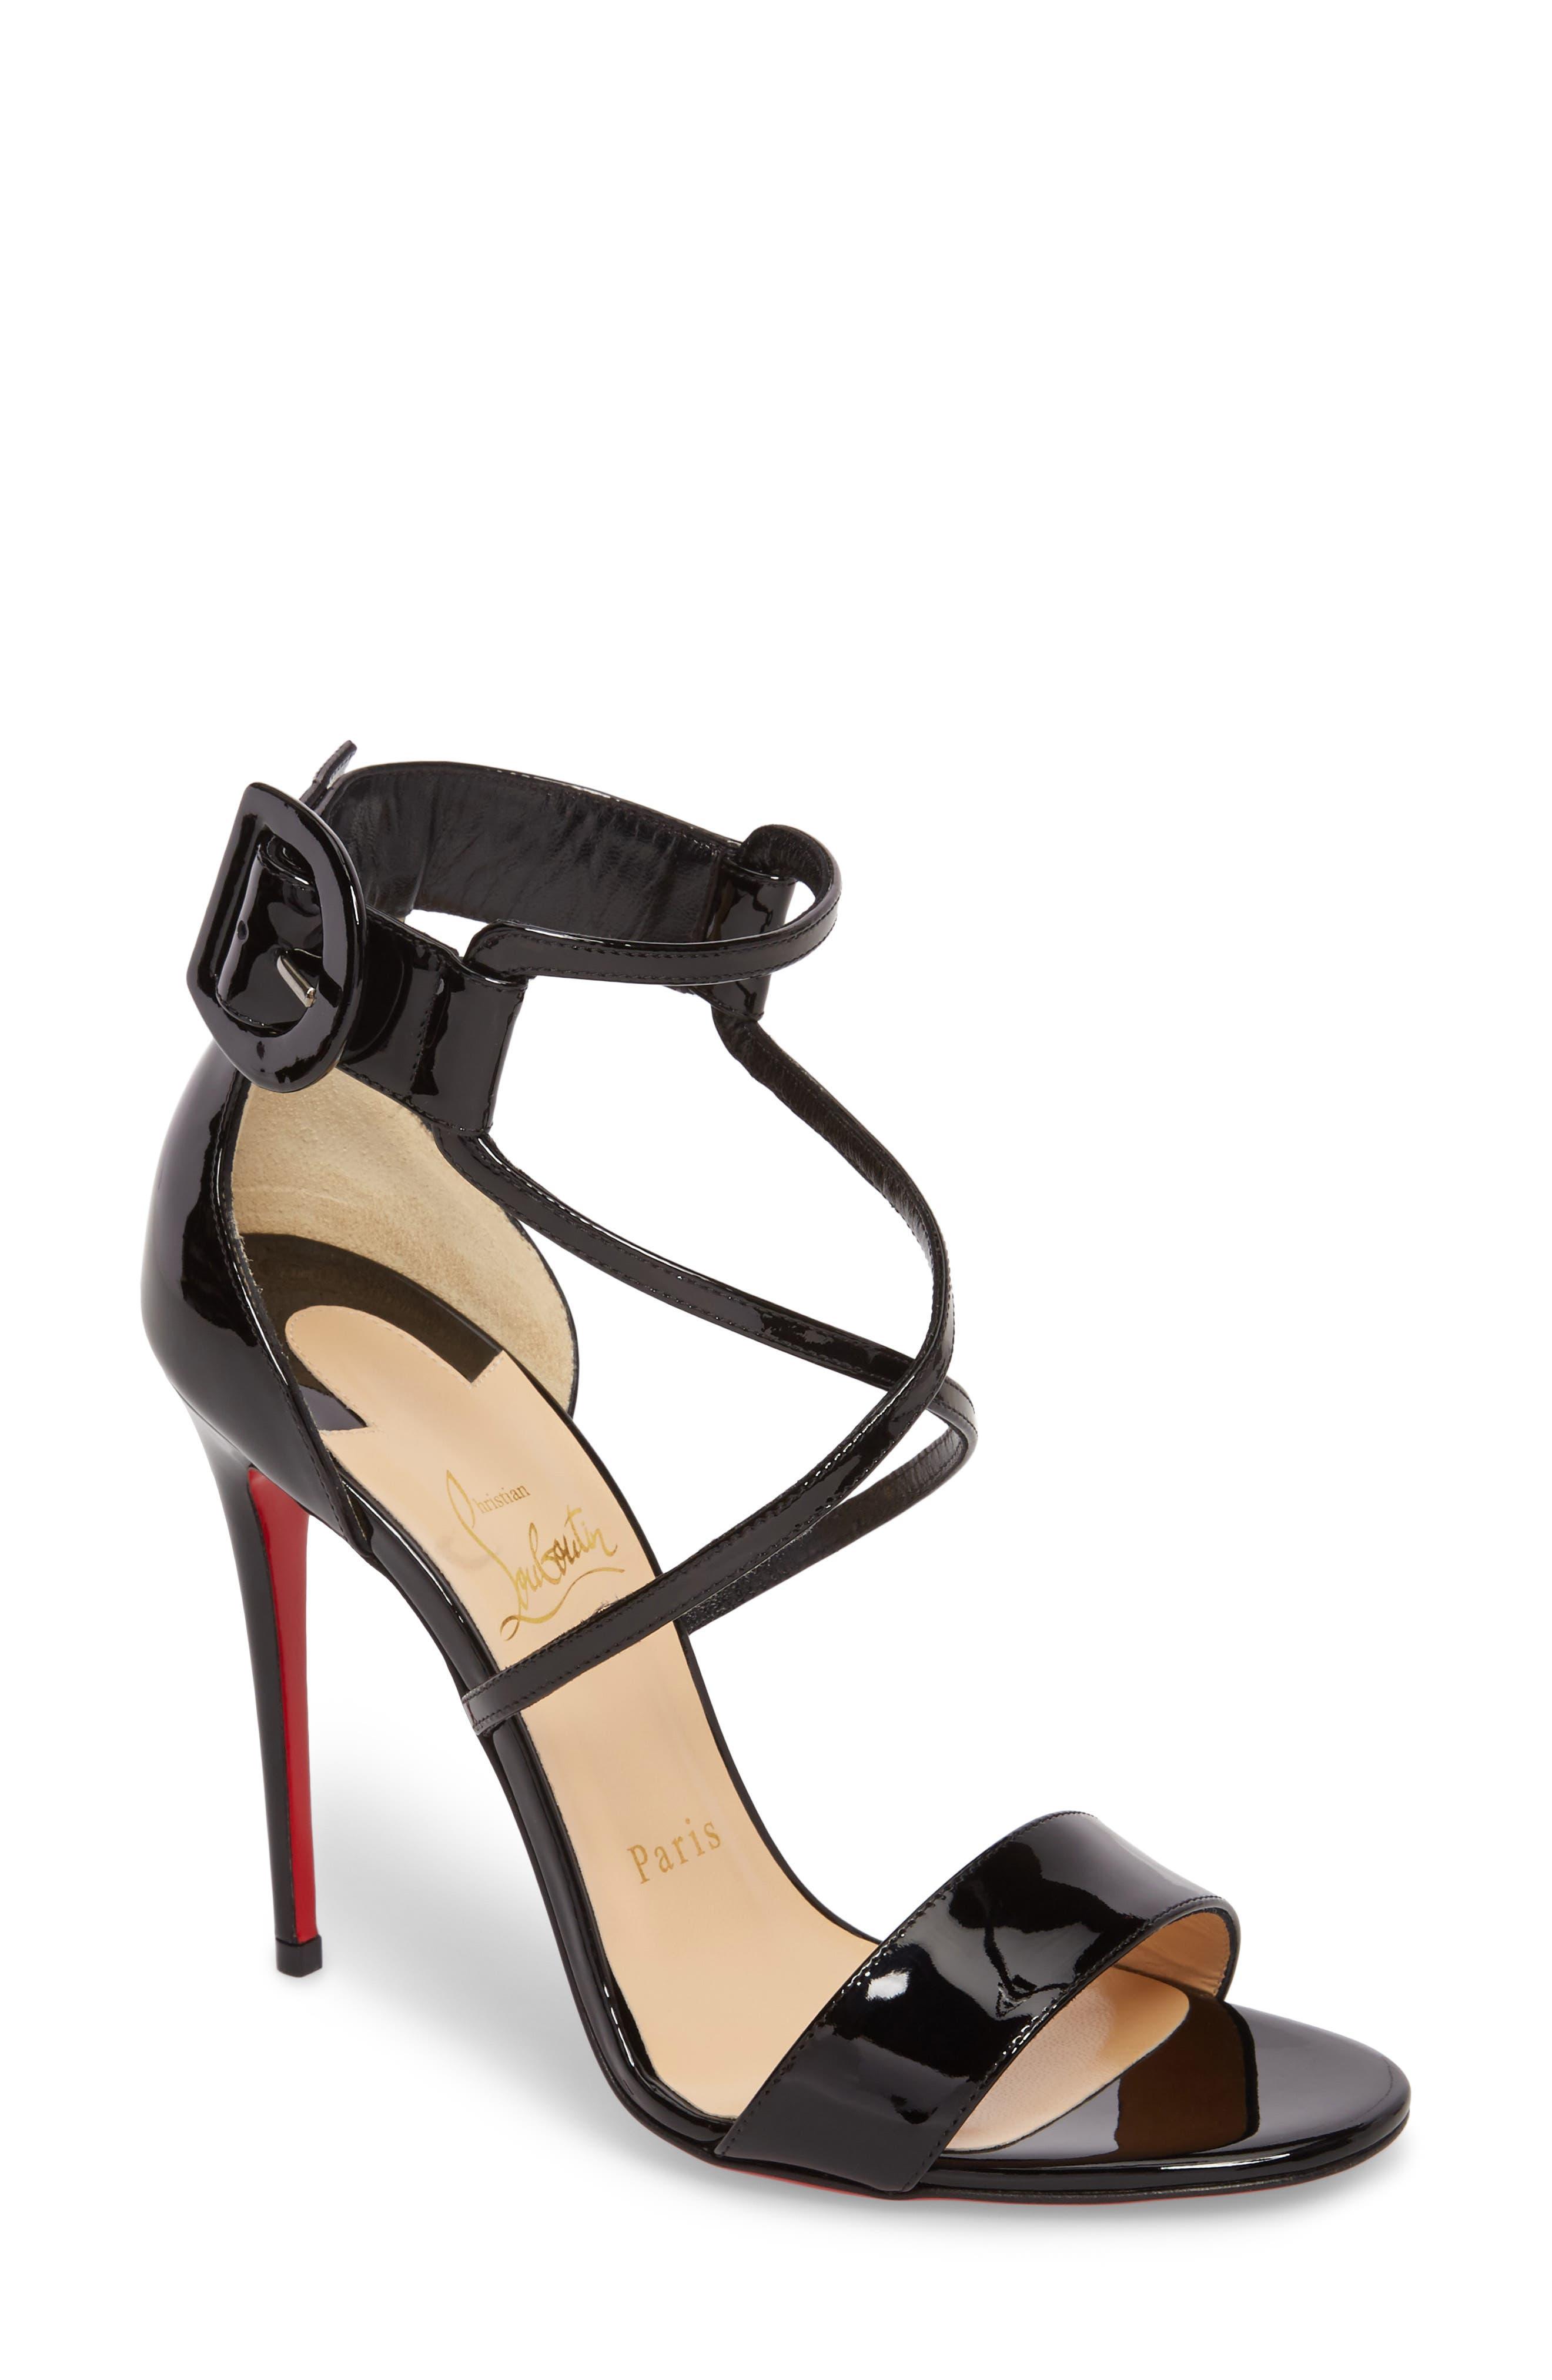 c054b499888 Christian Louboutin Women s Sandals Shoes